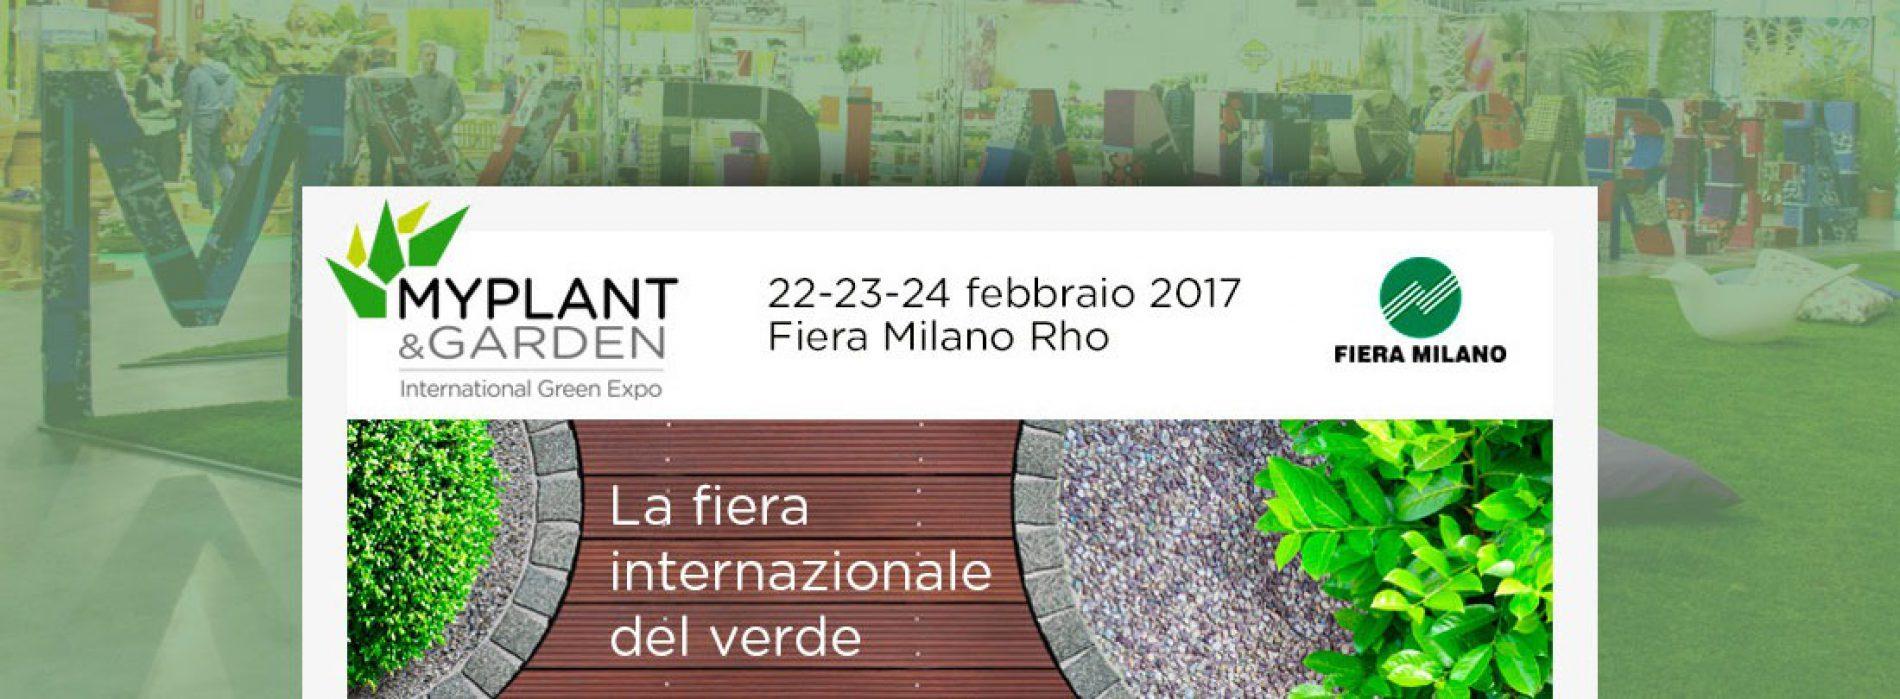 Myplant & Garden: evento dedicato a edilizia verde e giardini